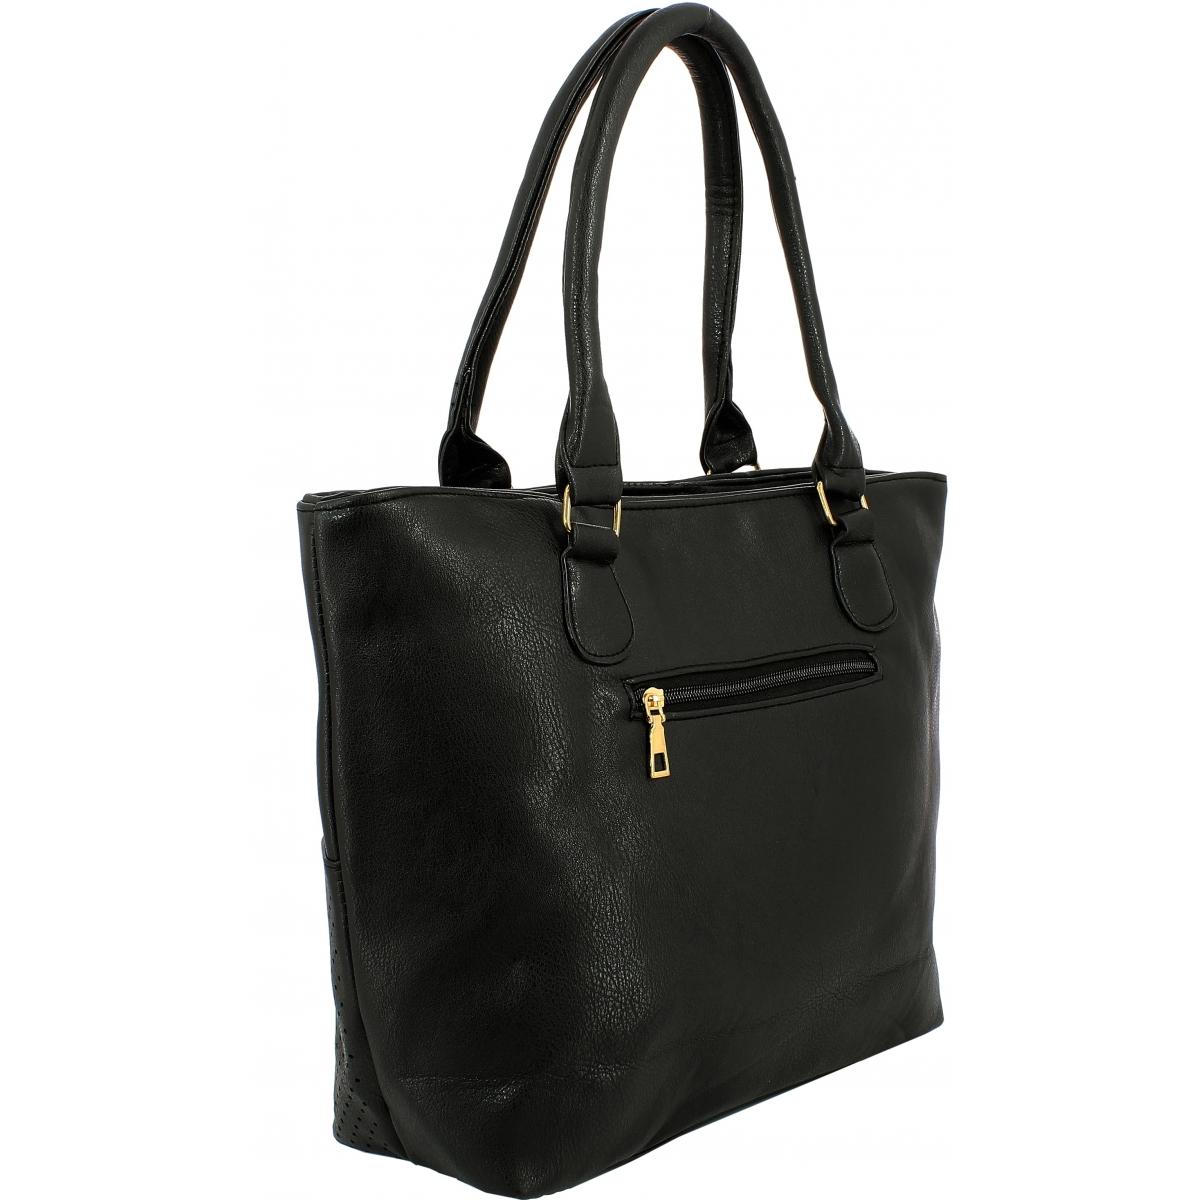 sac main shopping krlot taille l fkg0338 couleur. Black Bedroom Furniture Sets. Home Design Ideas